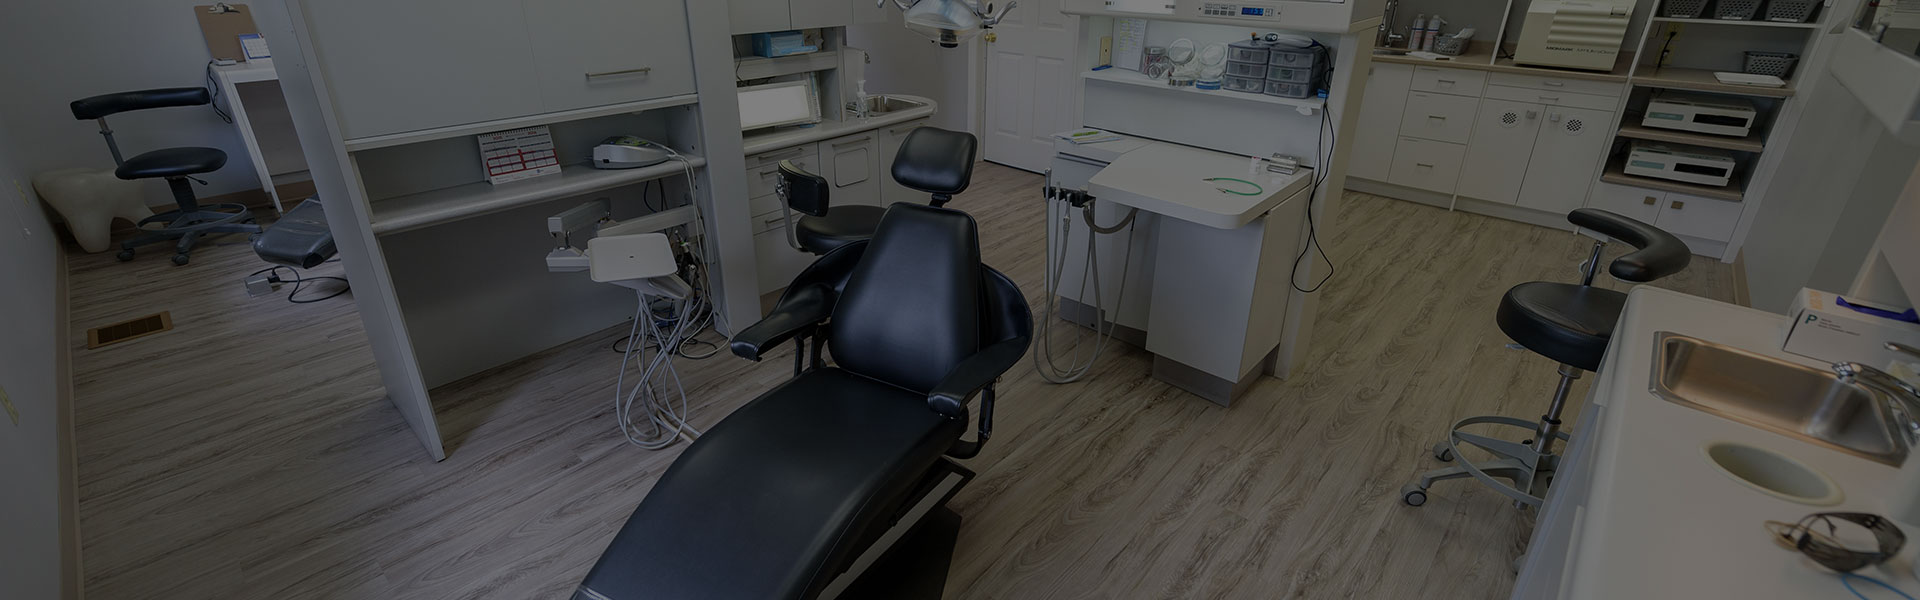 alliance_dental-coldbrook-3